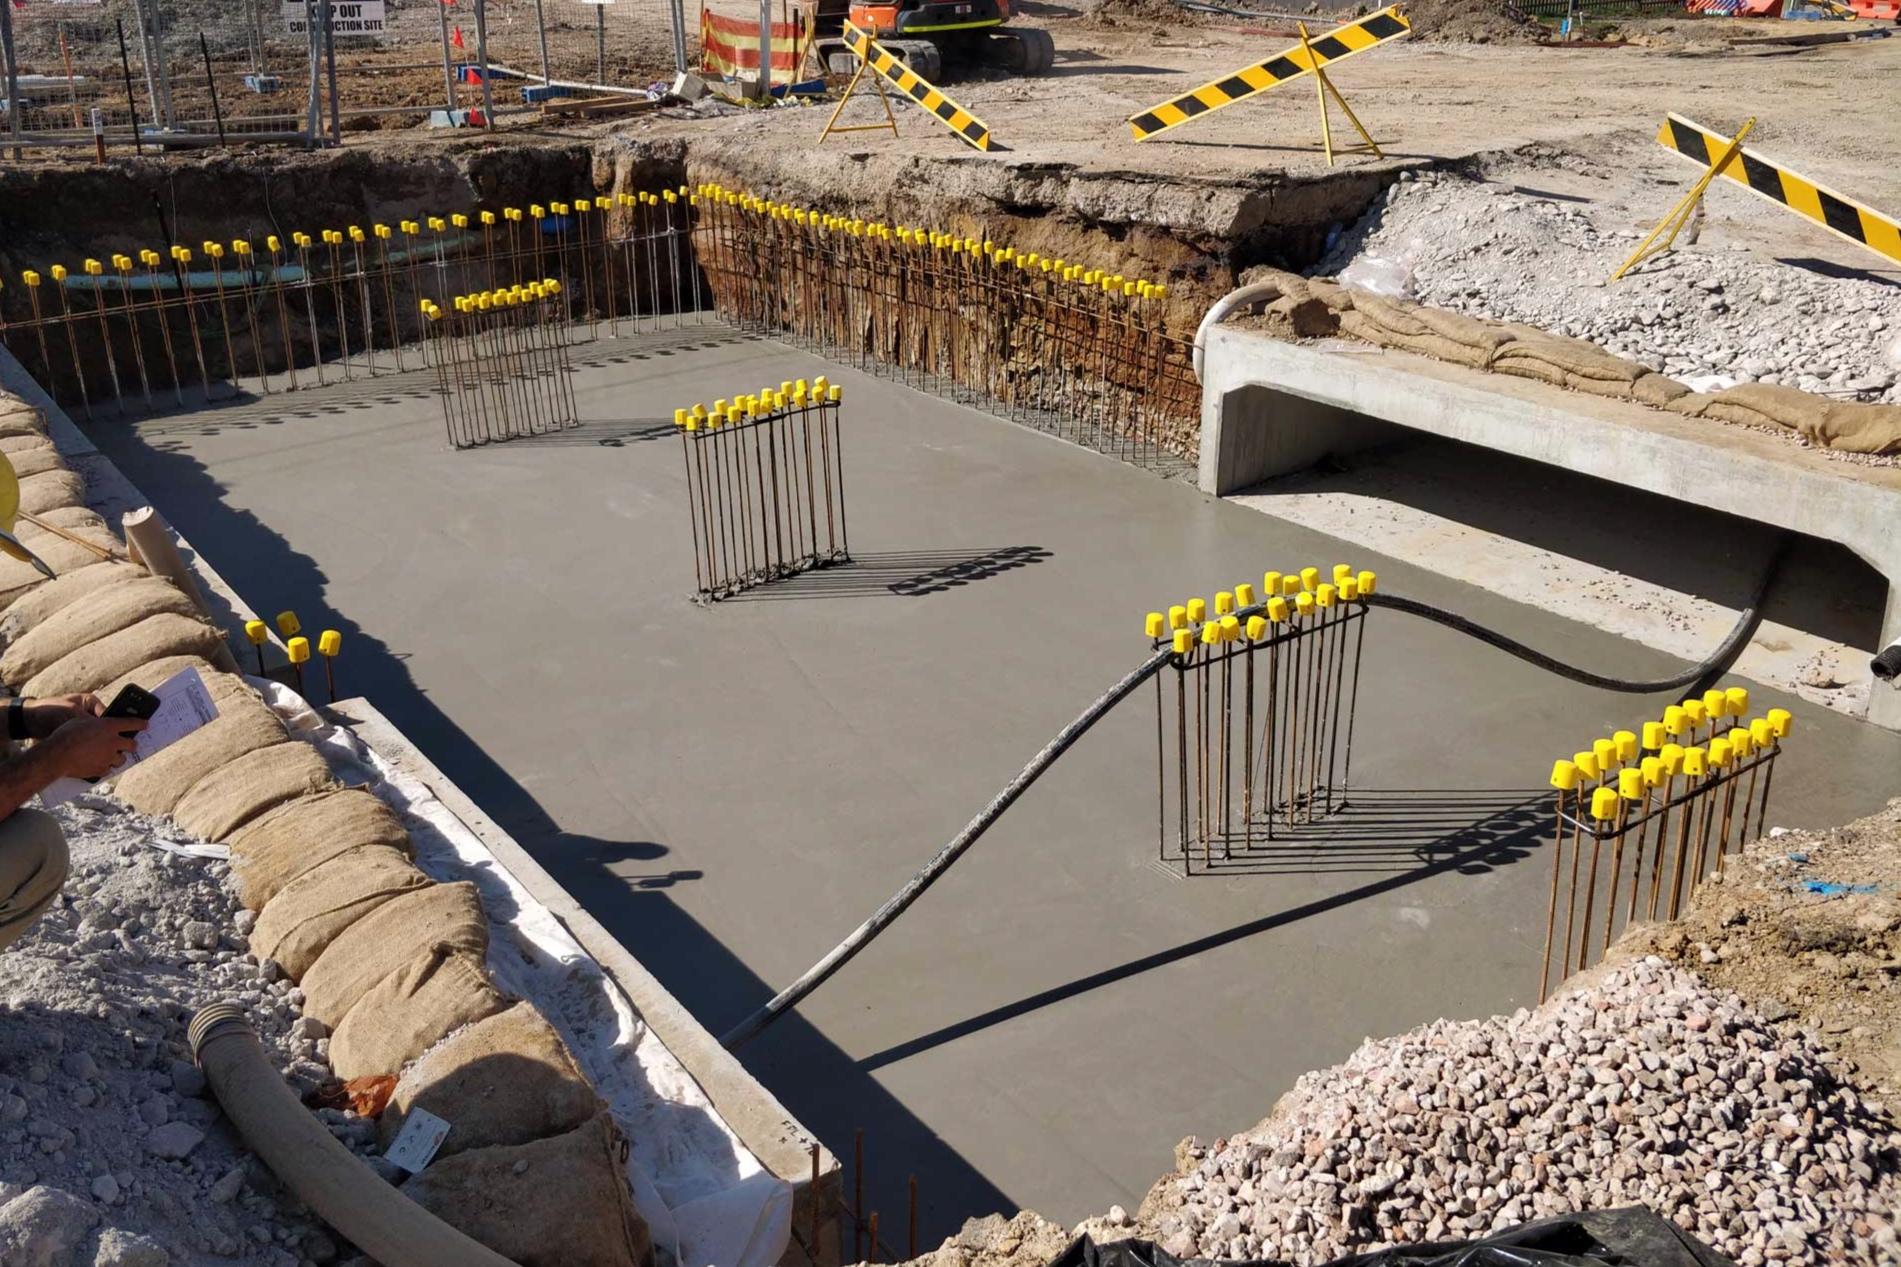 CIVIL STRUCTURES - BridgesCulvertsDrainage pitsRetaining walls